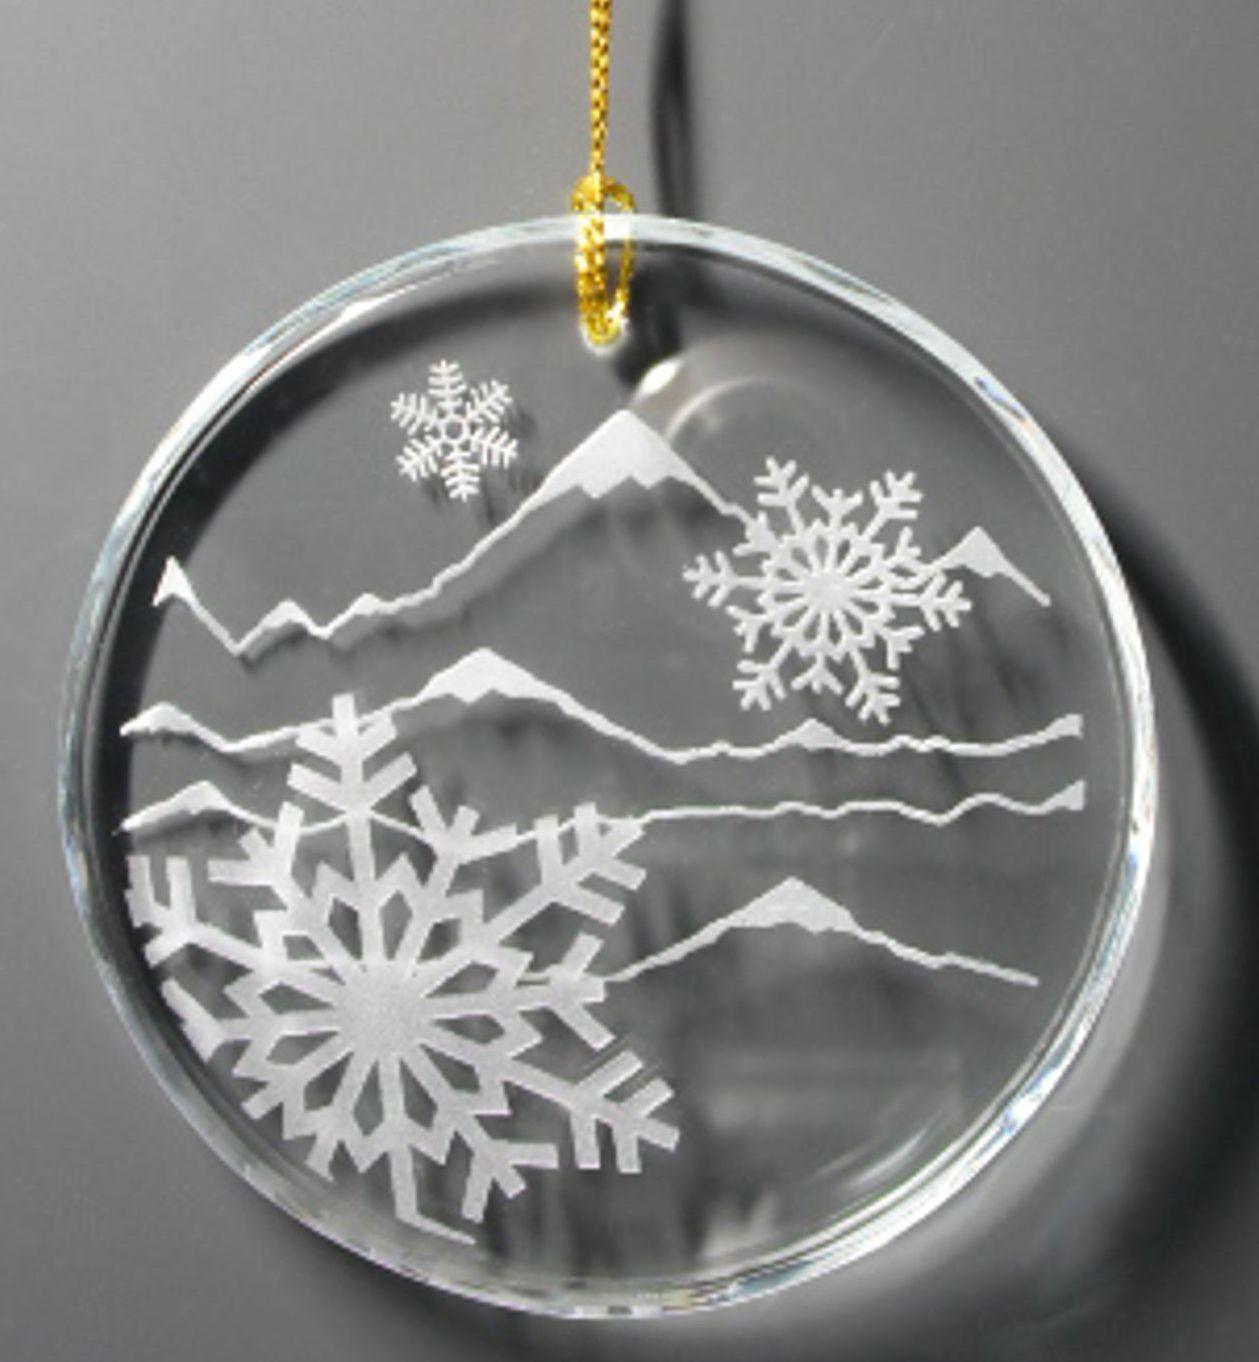 Crystal Snowflake Ornament Gifts Christmas ornaments